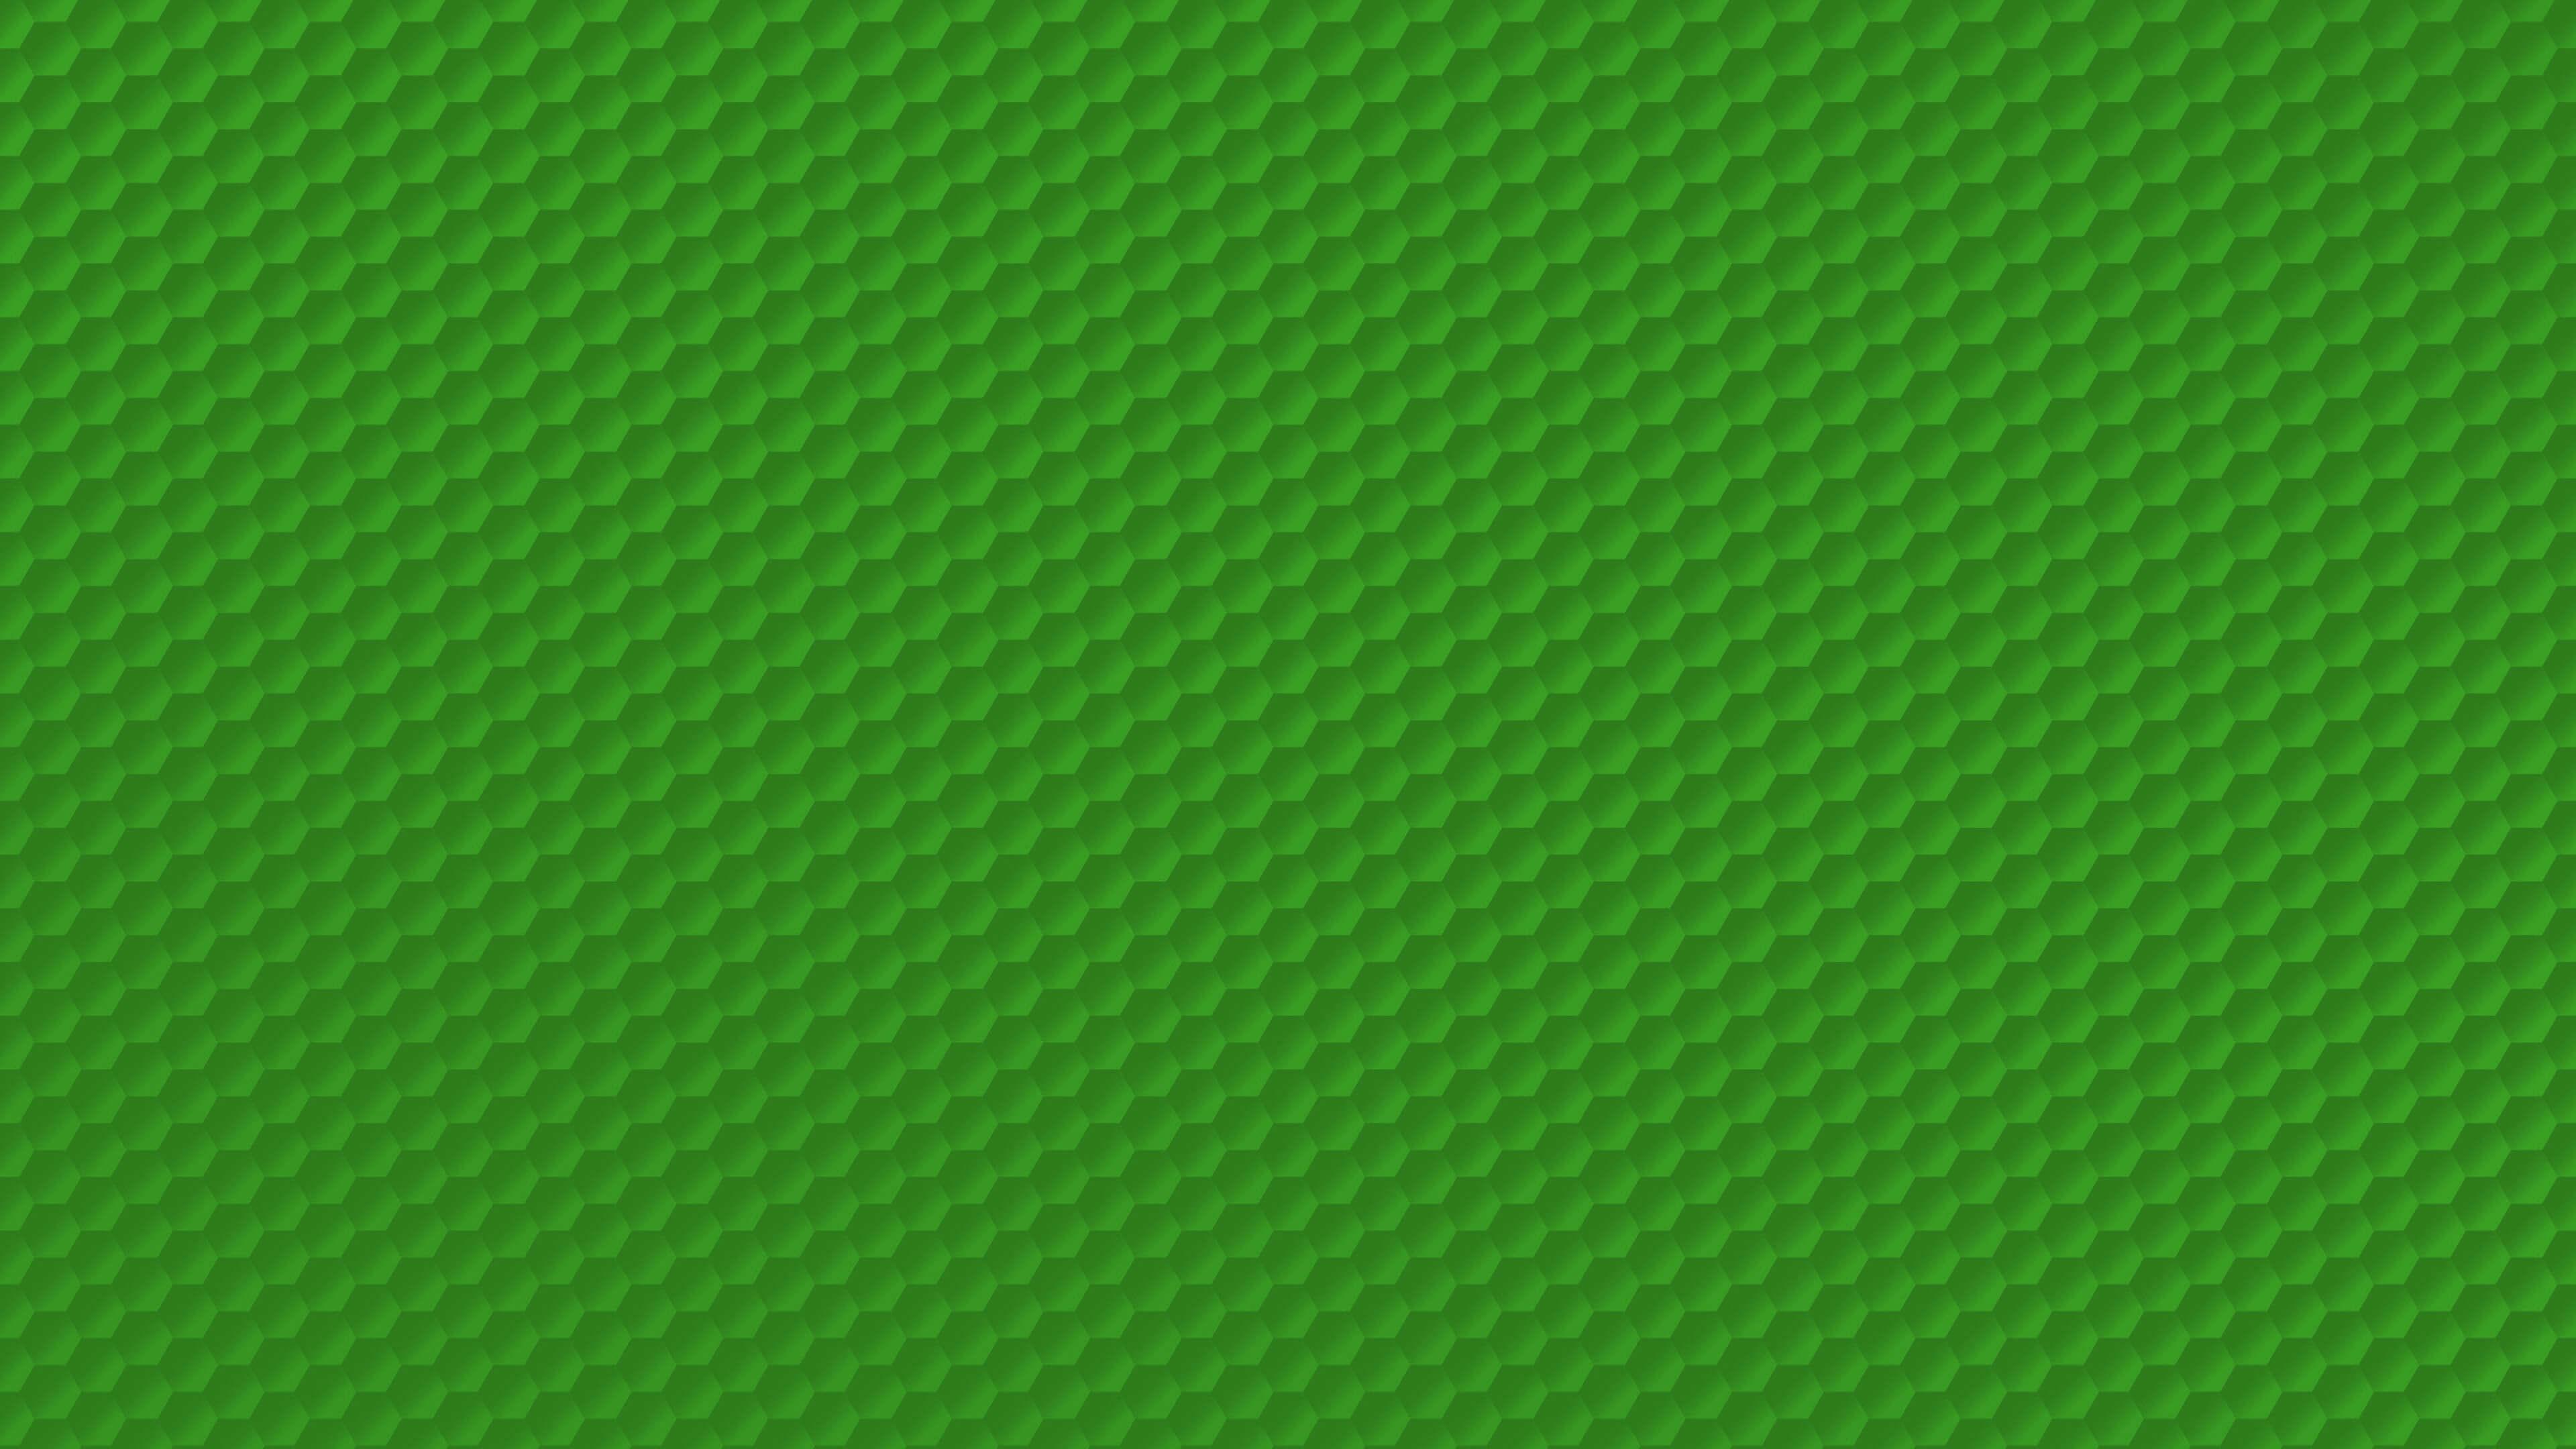 Green Honeycomb Pattern 4K Wallpapers 3840x2160